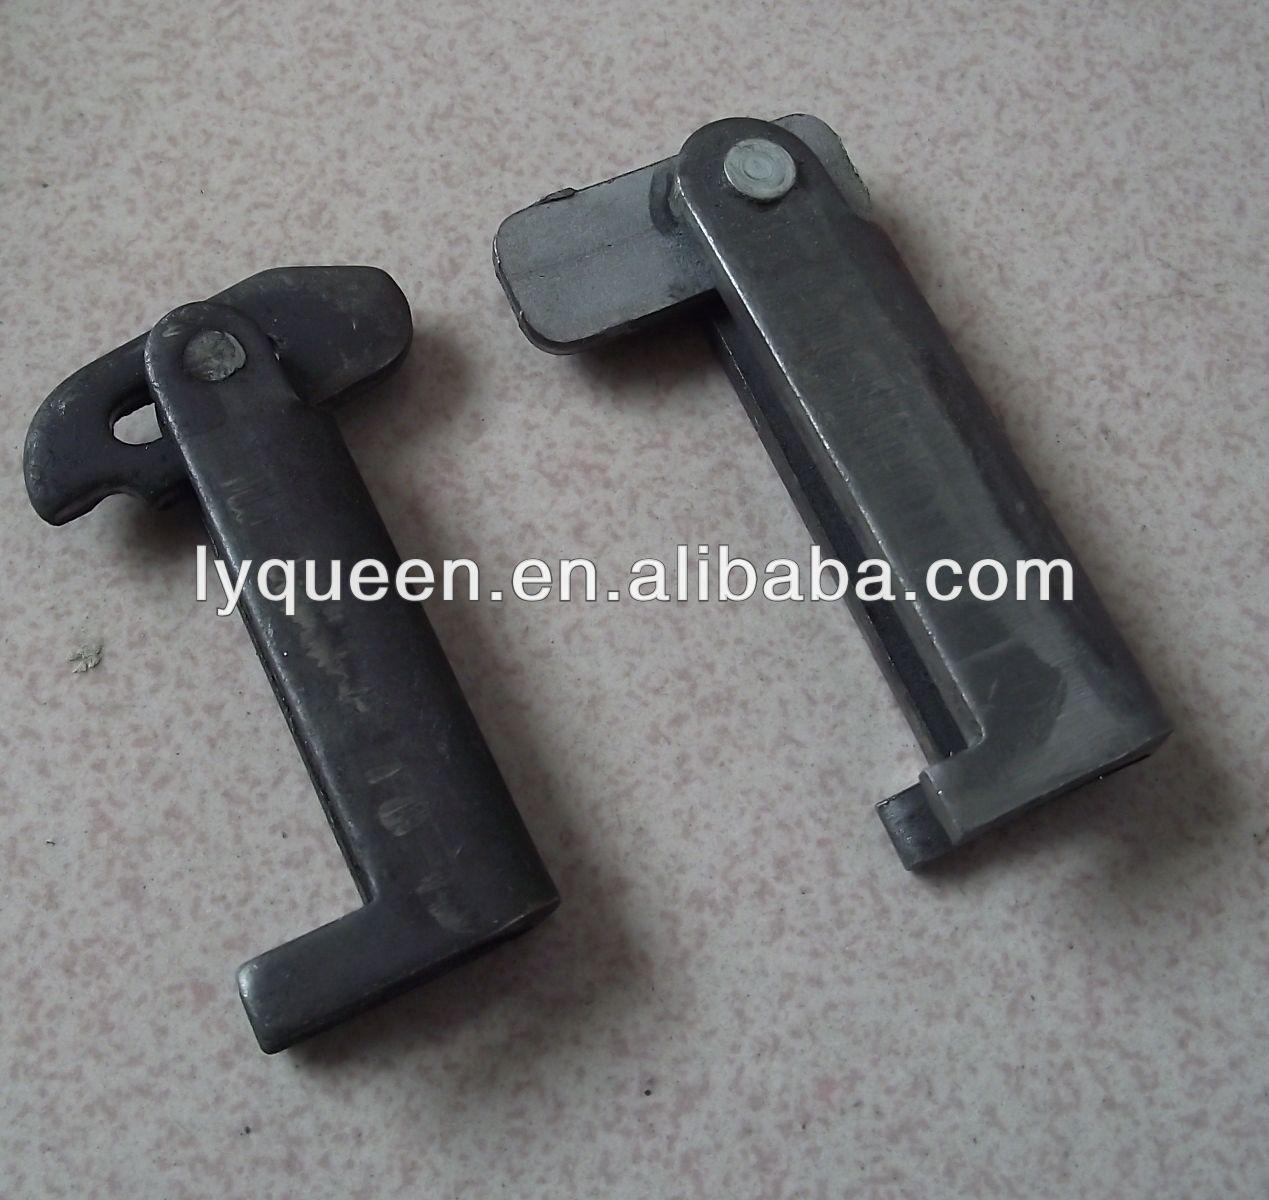 Scaffolding Snap Pin : Scaffolding snap lock pin toggle formwork